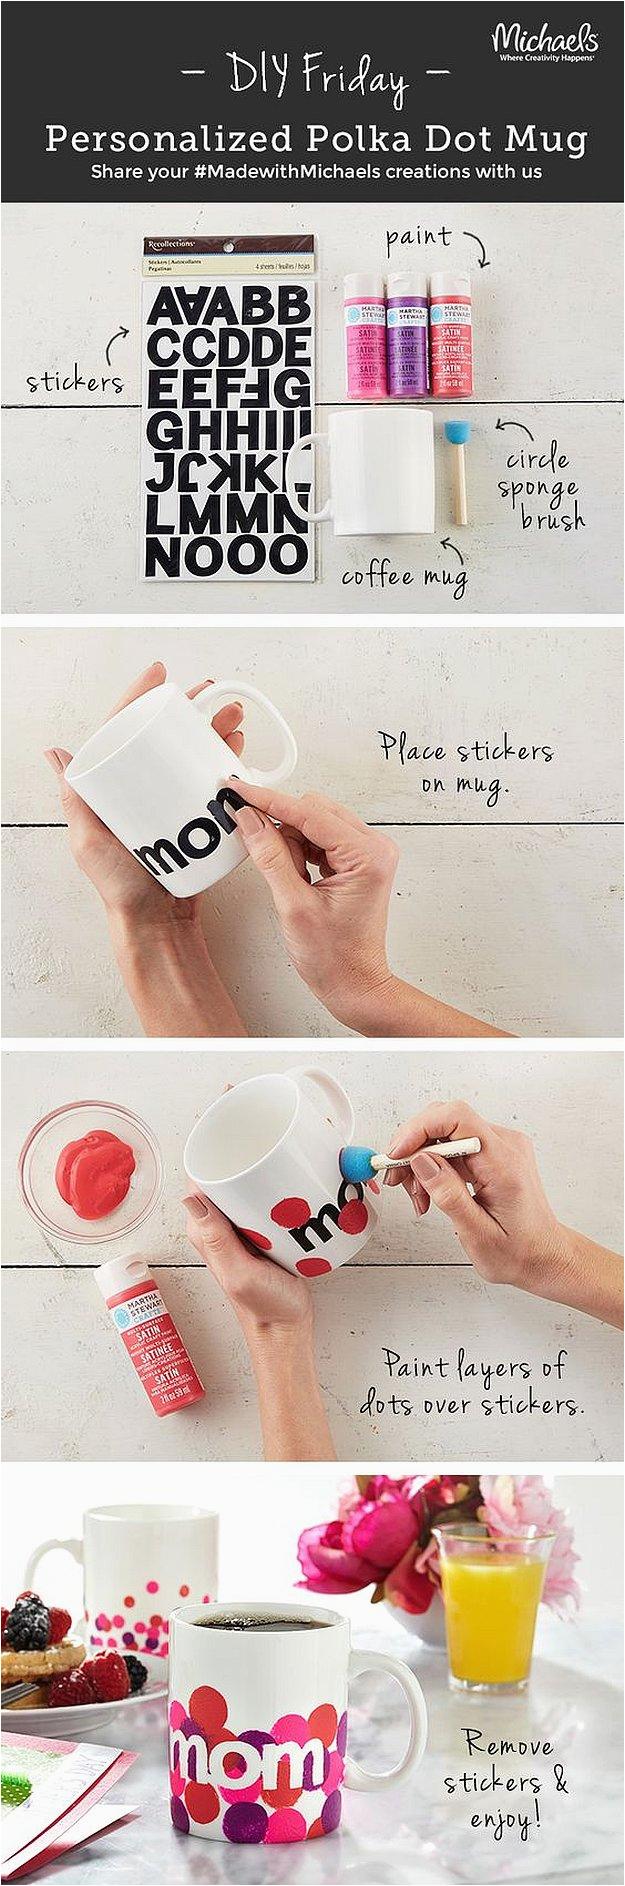 10 diy birthday gift ideas for mom diy projects craft